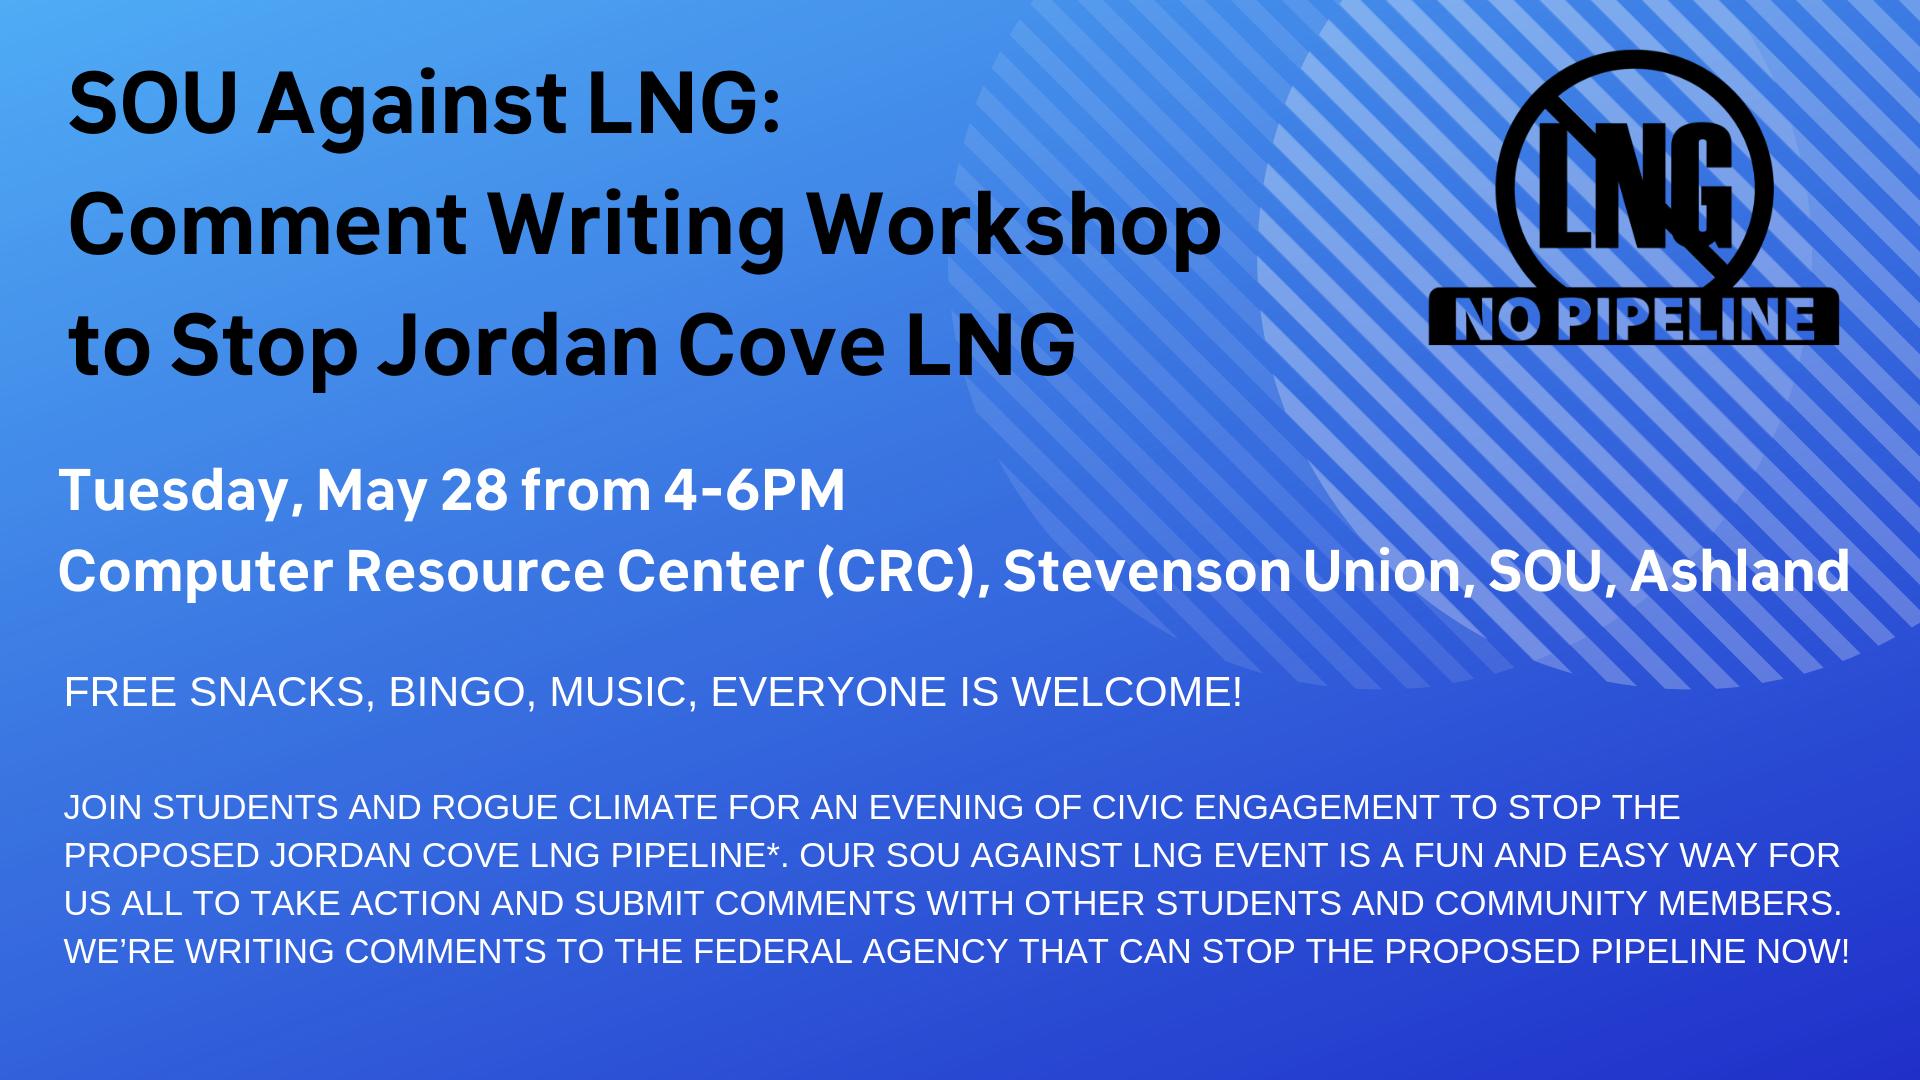 FB_SOU Against LNG_ Comment Writing Workshop to Stop Jordan Cove LNG.png